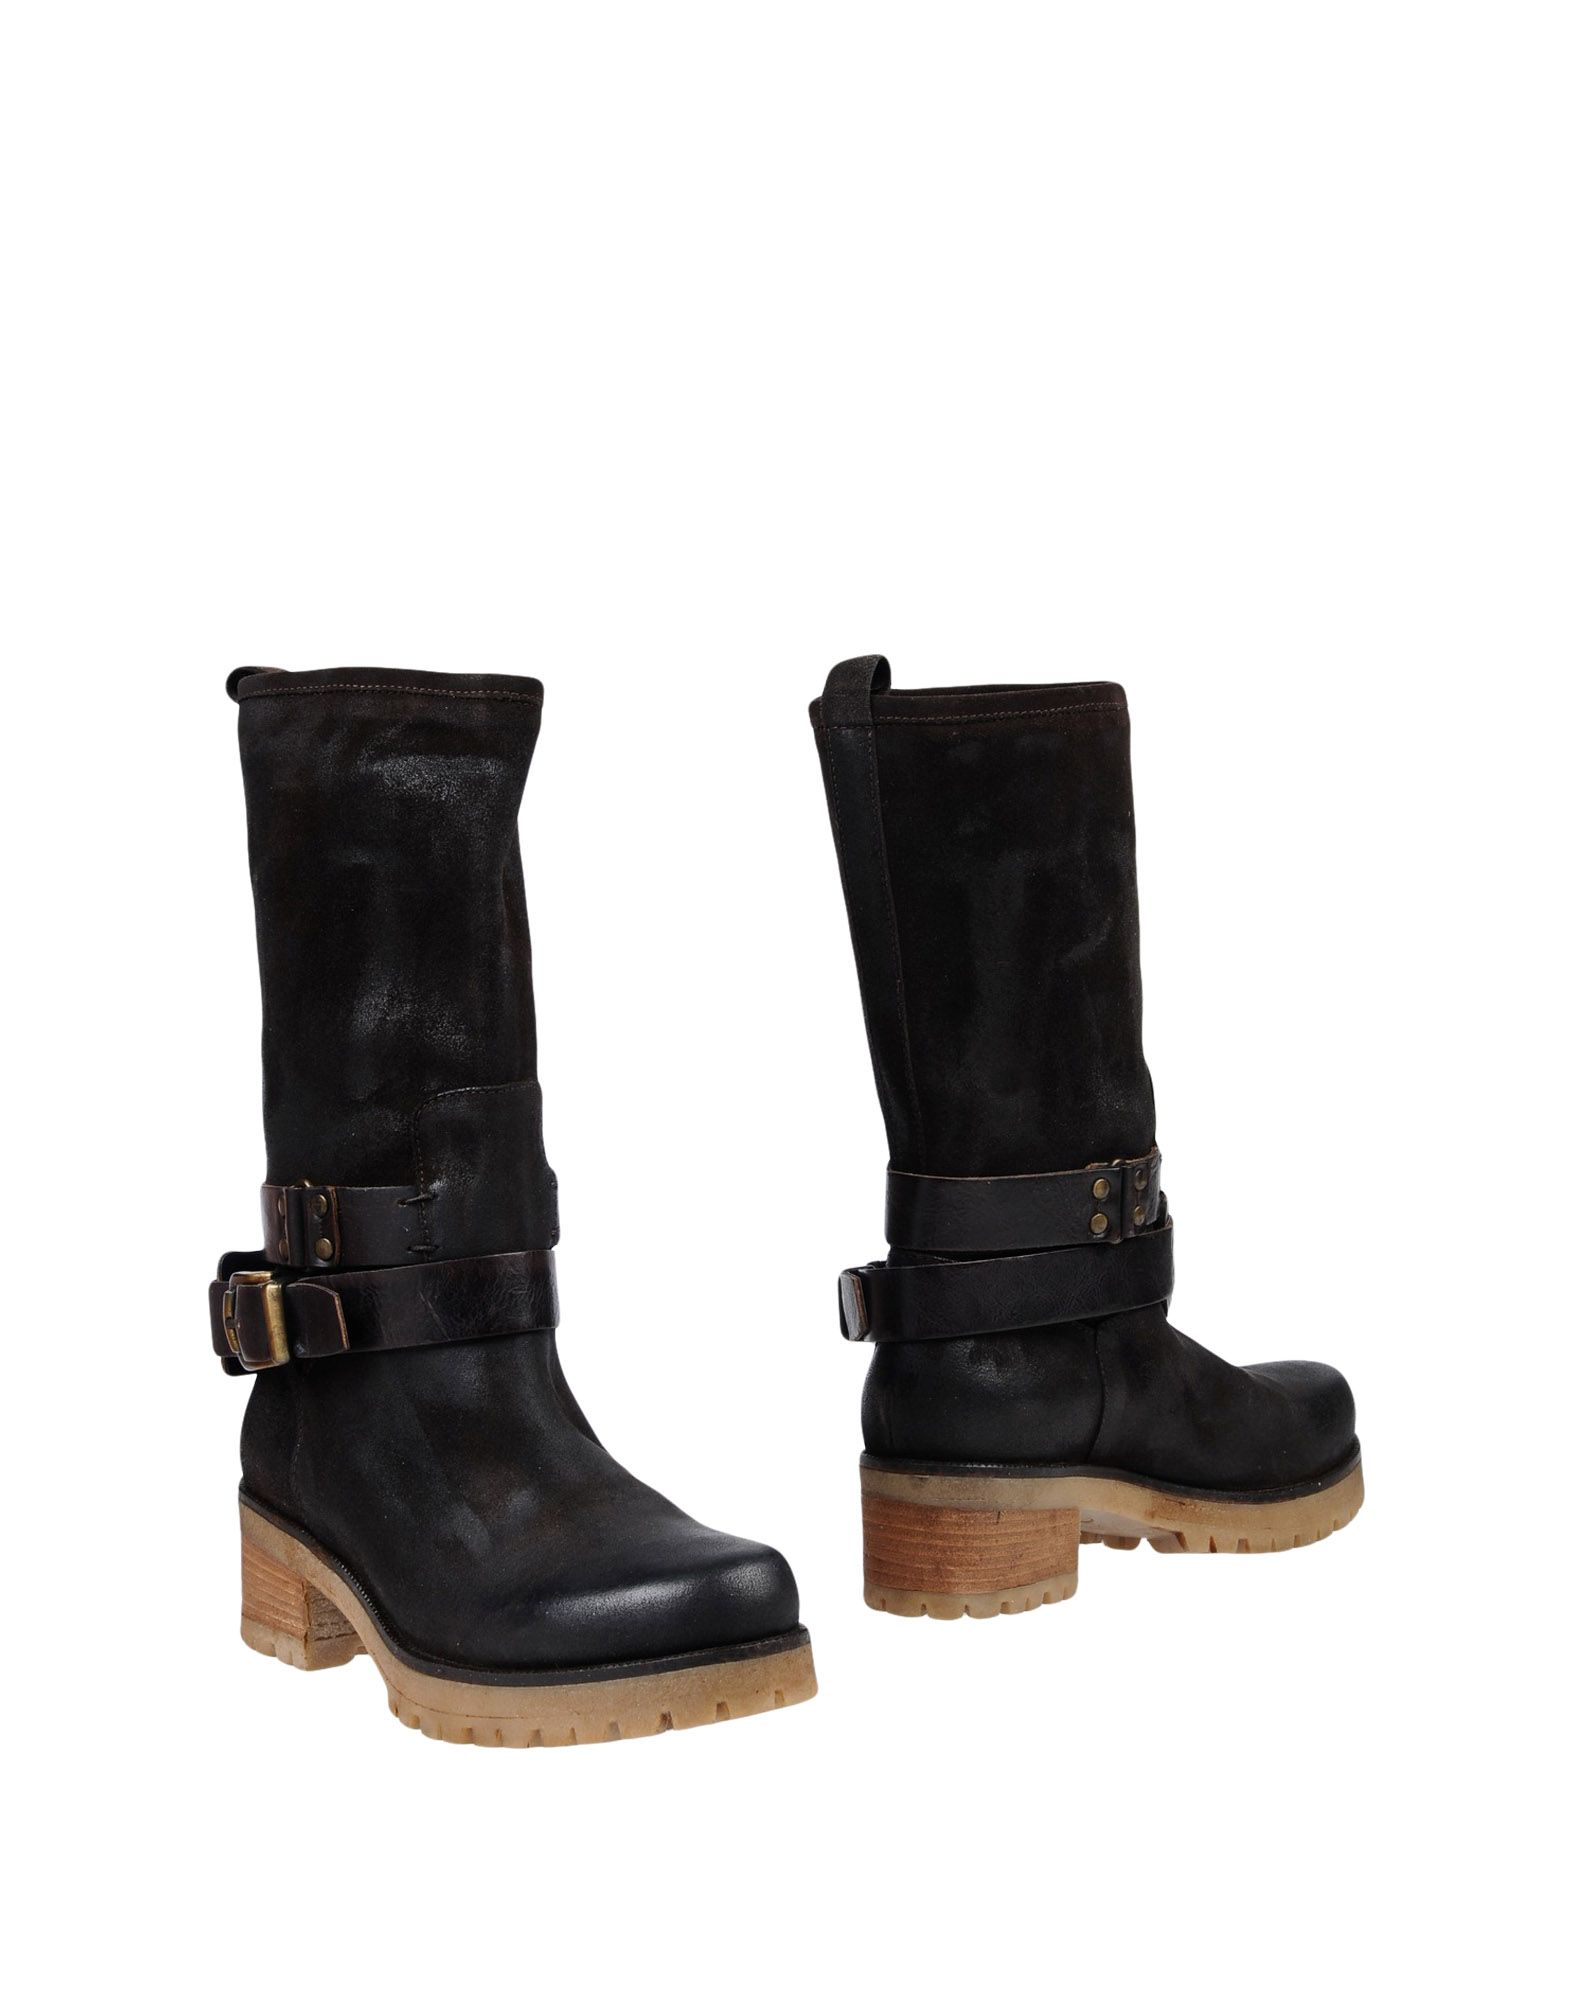 BRYAN BLAKE Полусапоги и высокие ботинки обложки r blake обложка